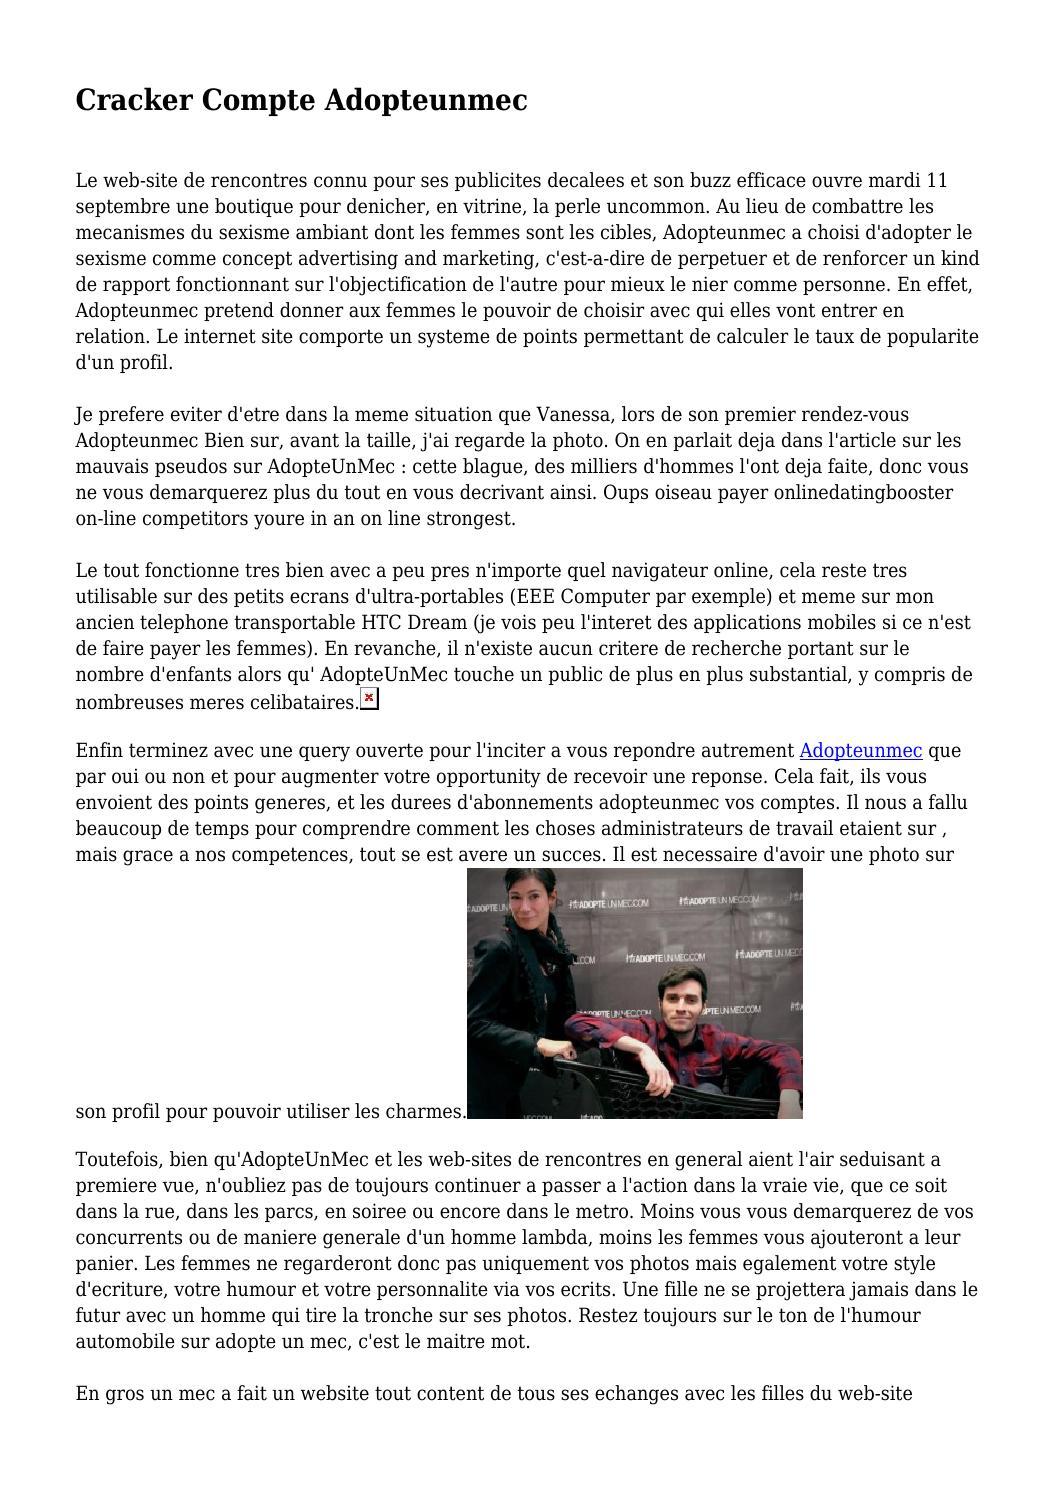 Adopteunmec site web